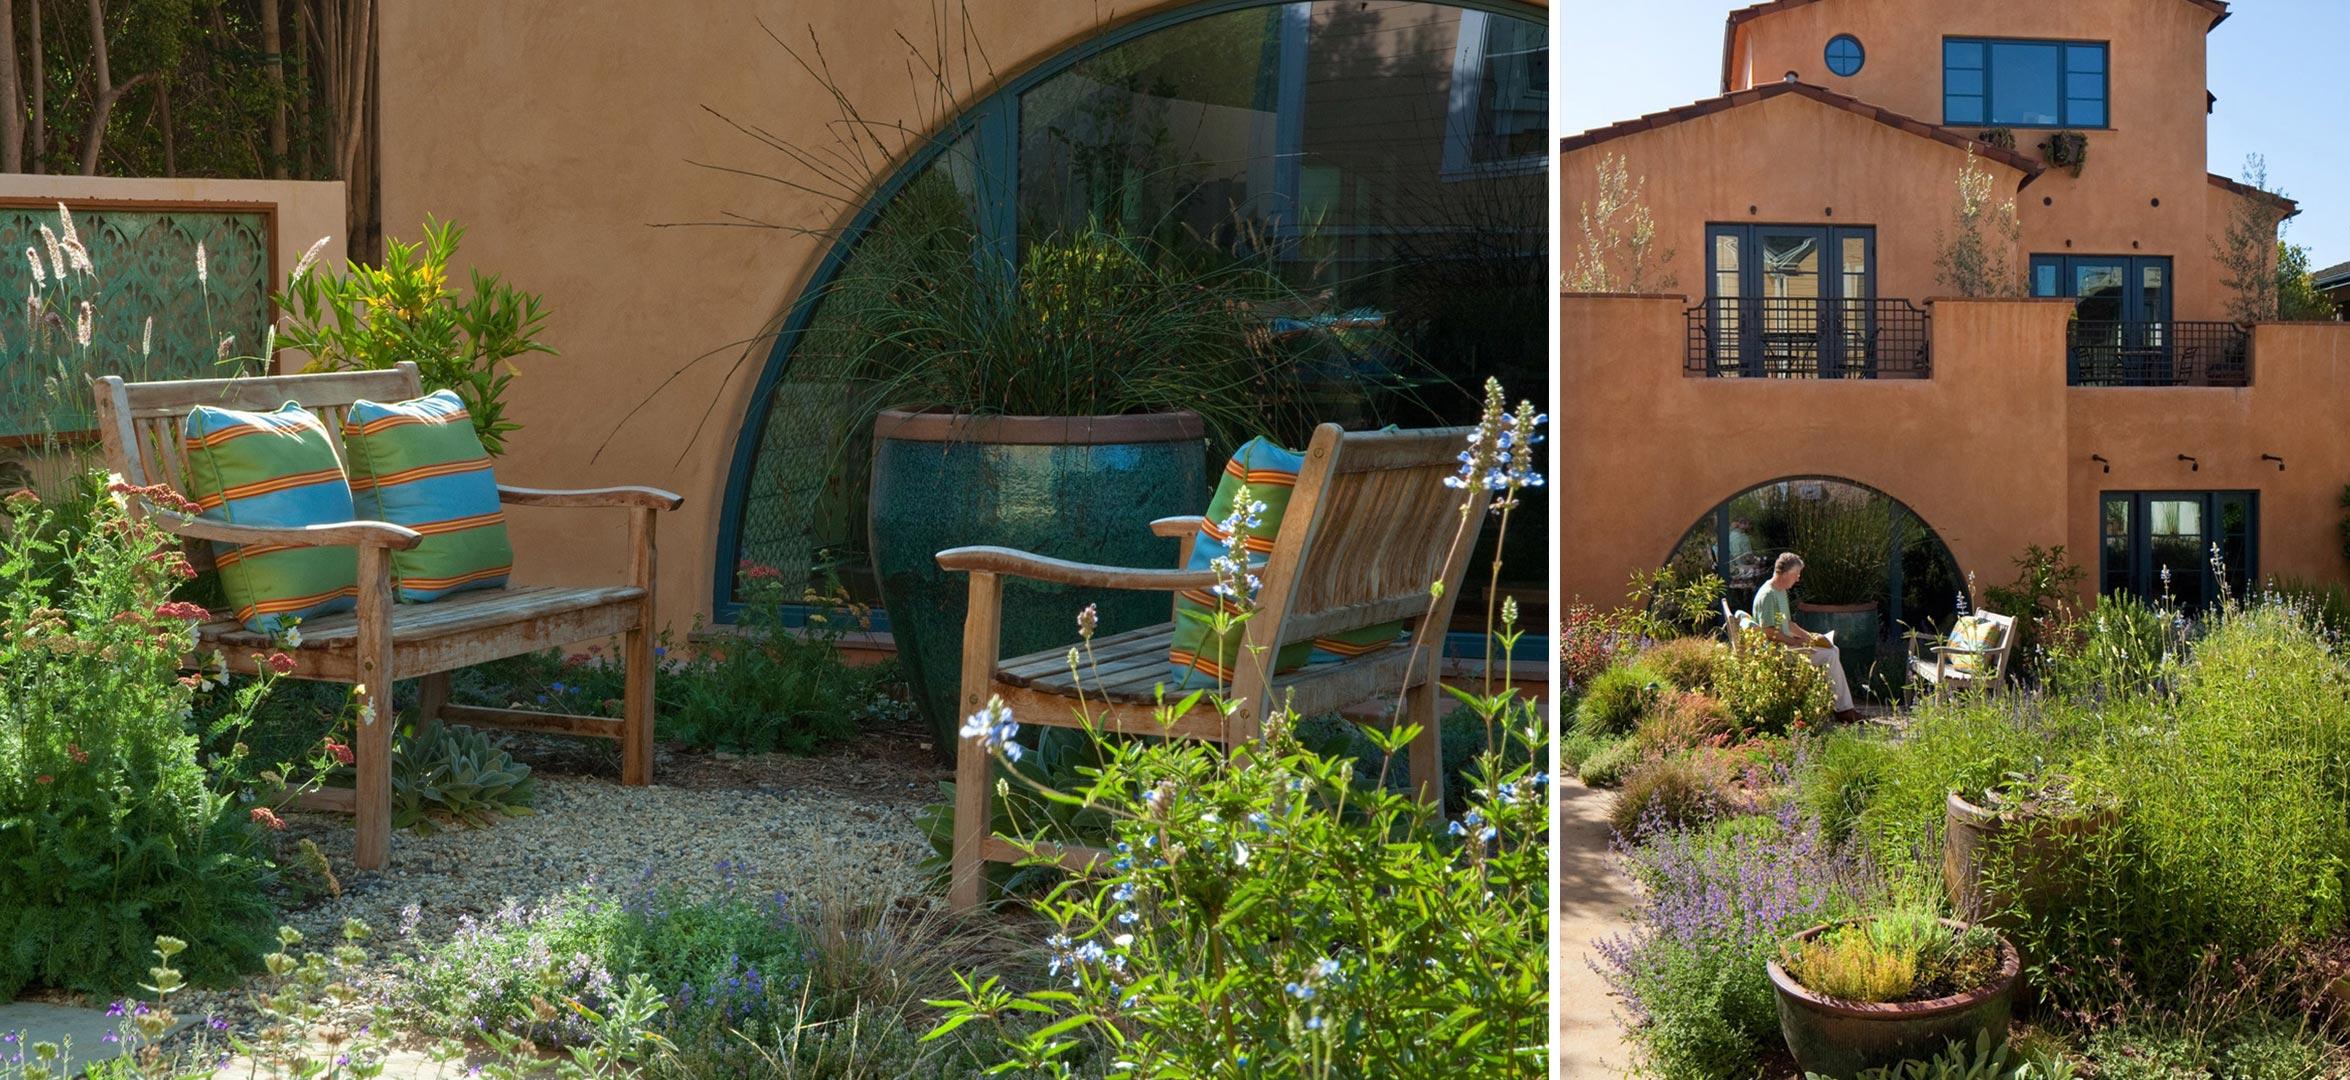 2-bench-seating-gravel-path.jpg